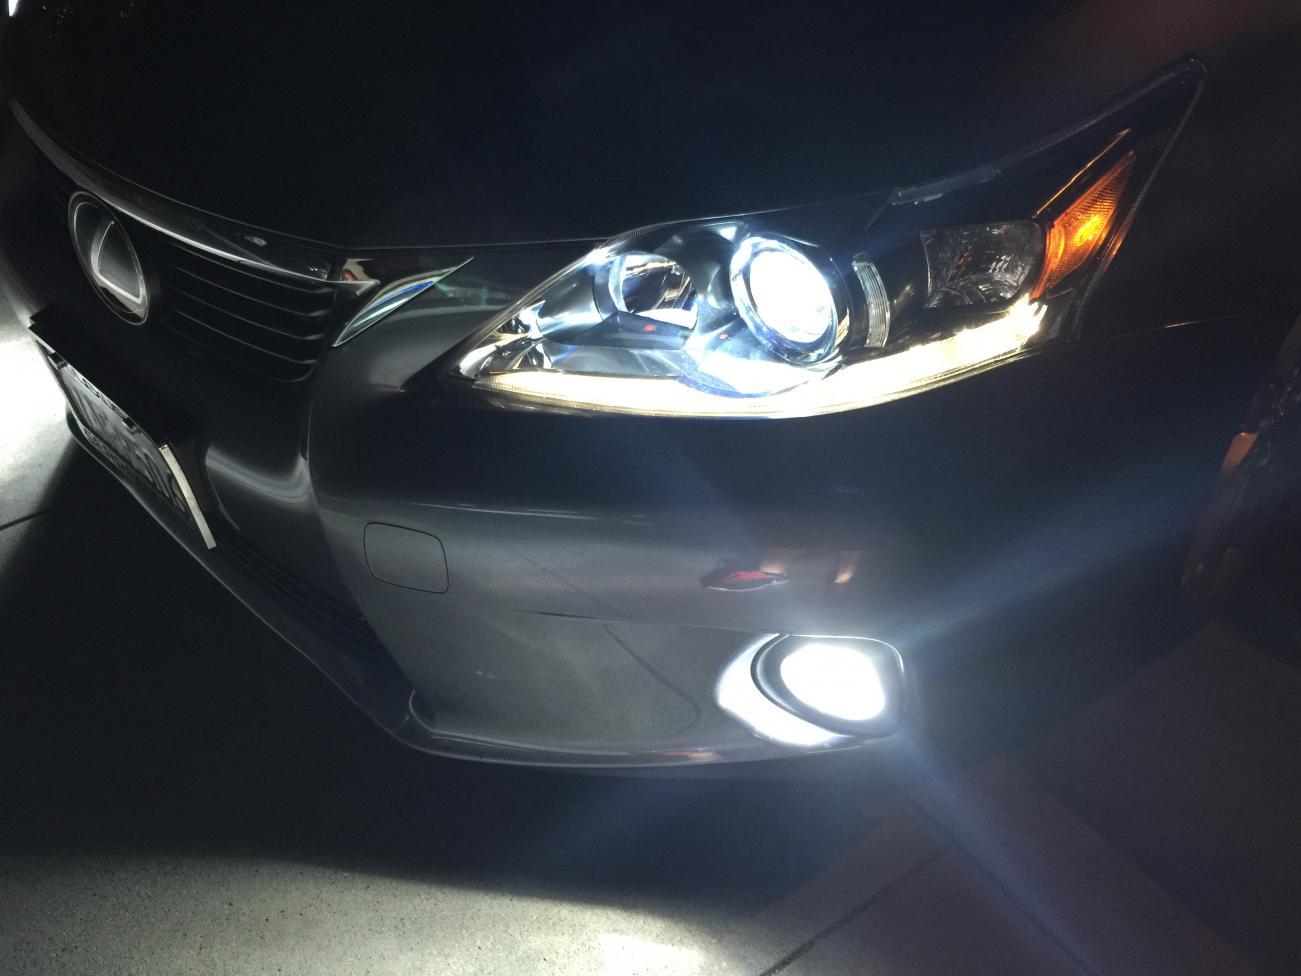 Lexus Is350 Headlight Wiring Diagram Lfa Headlights Rx300 Led Diagrams Schematics On Gx470